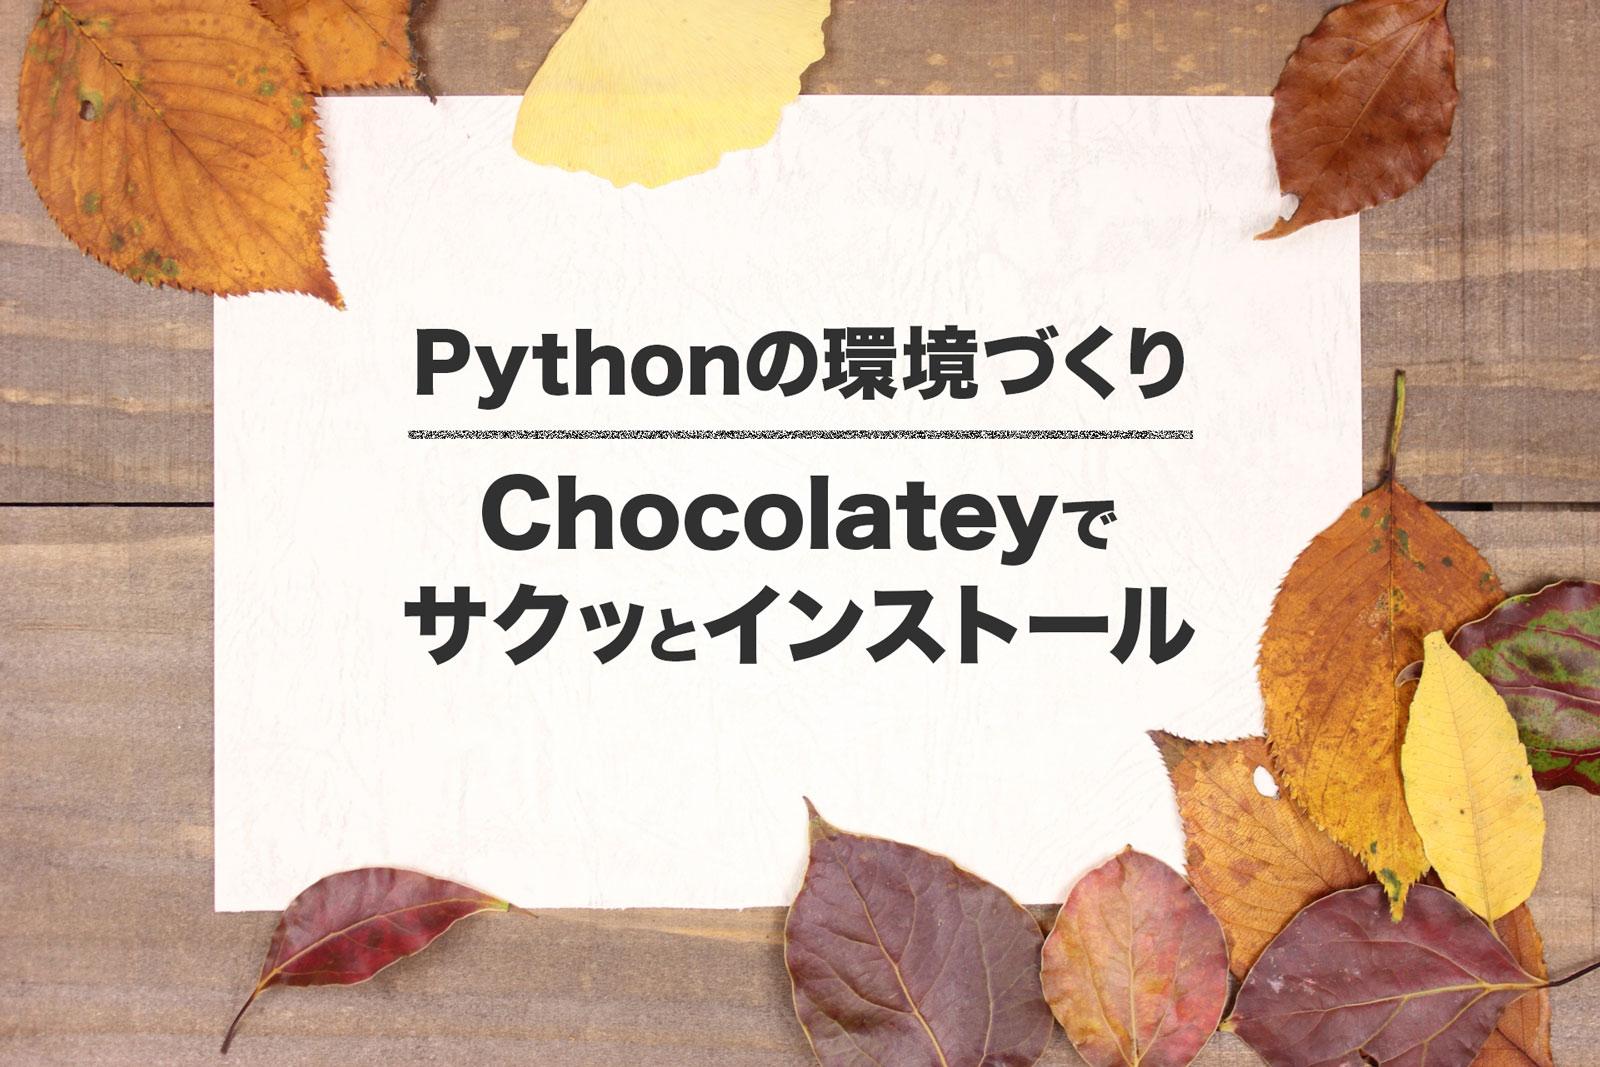 Pythonの環境づくり